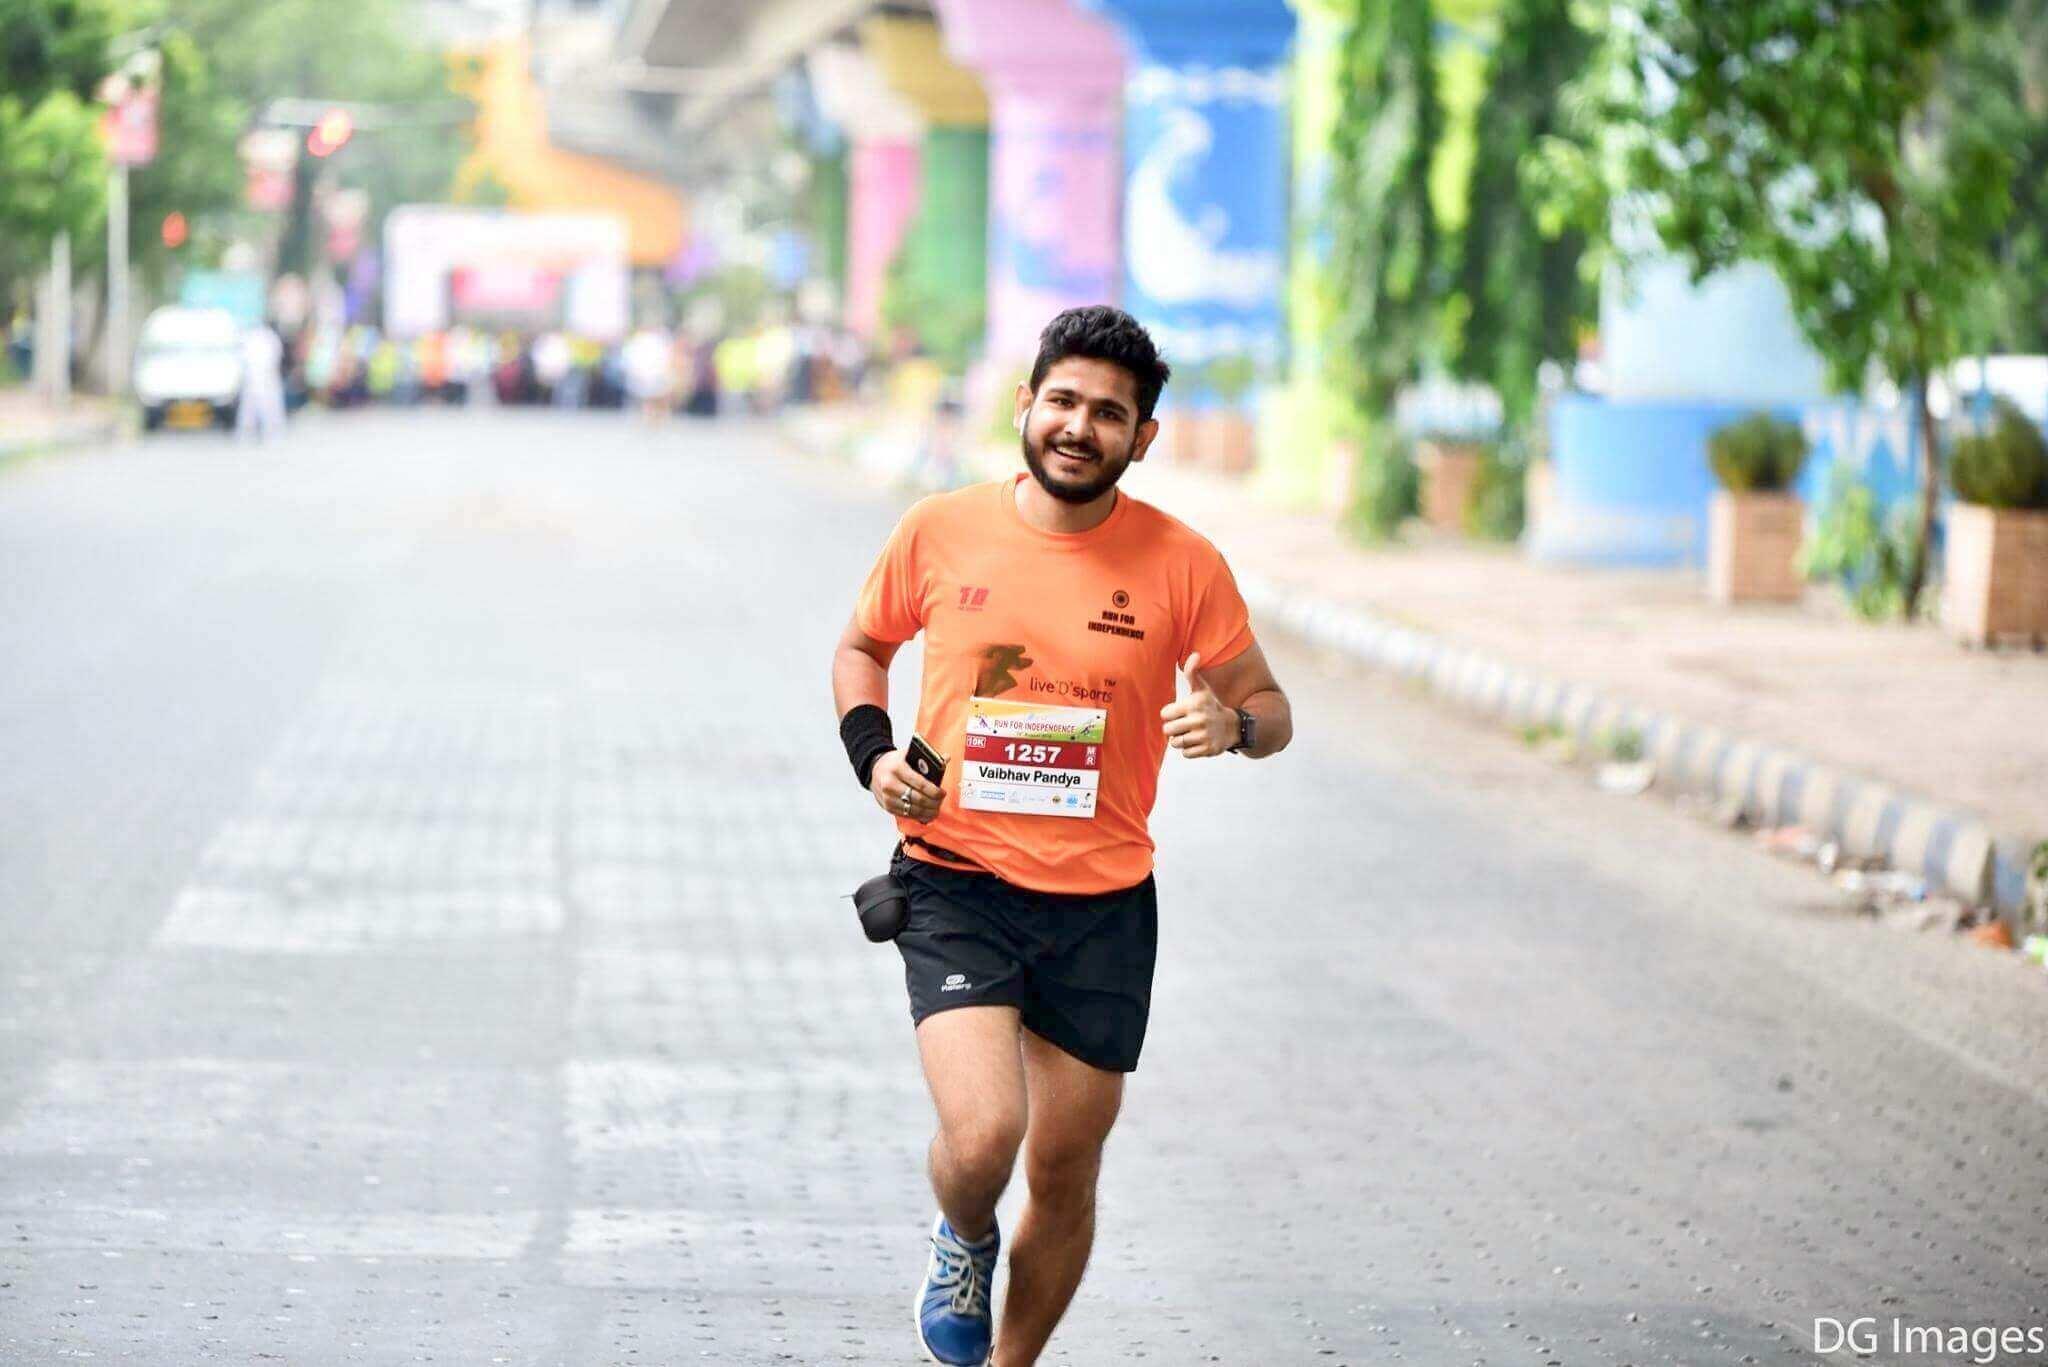 Vaibhav Pandya - Running is an addiction